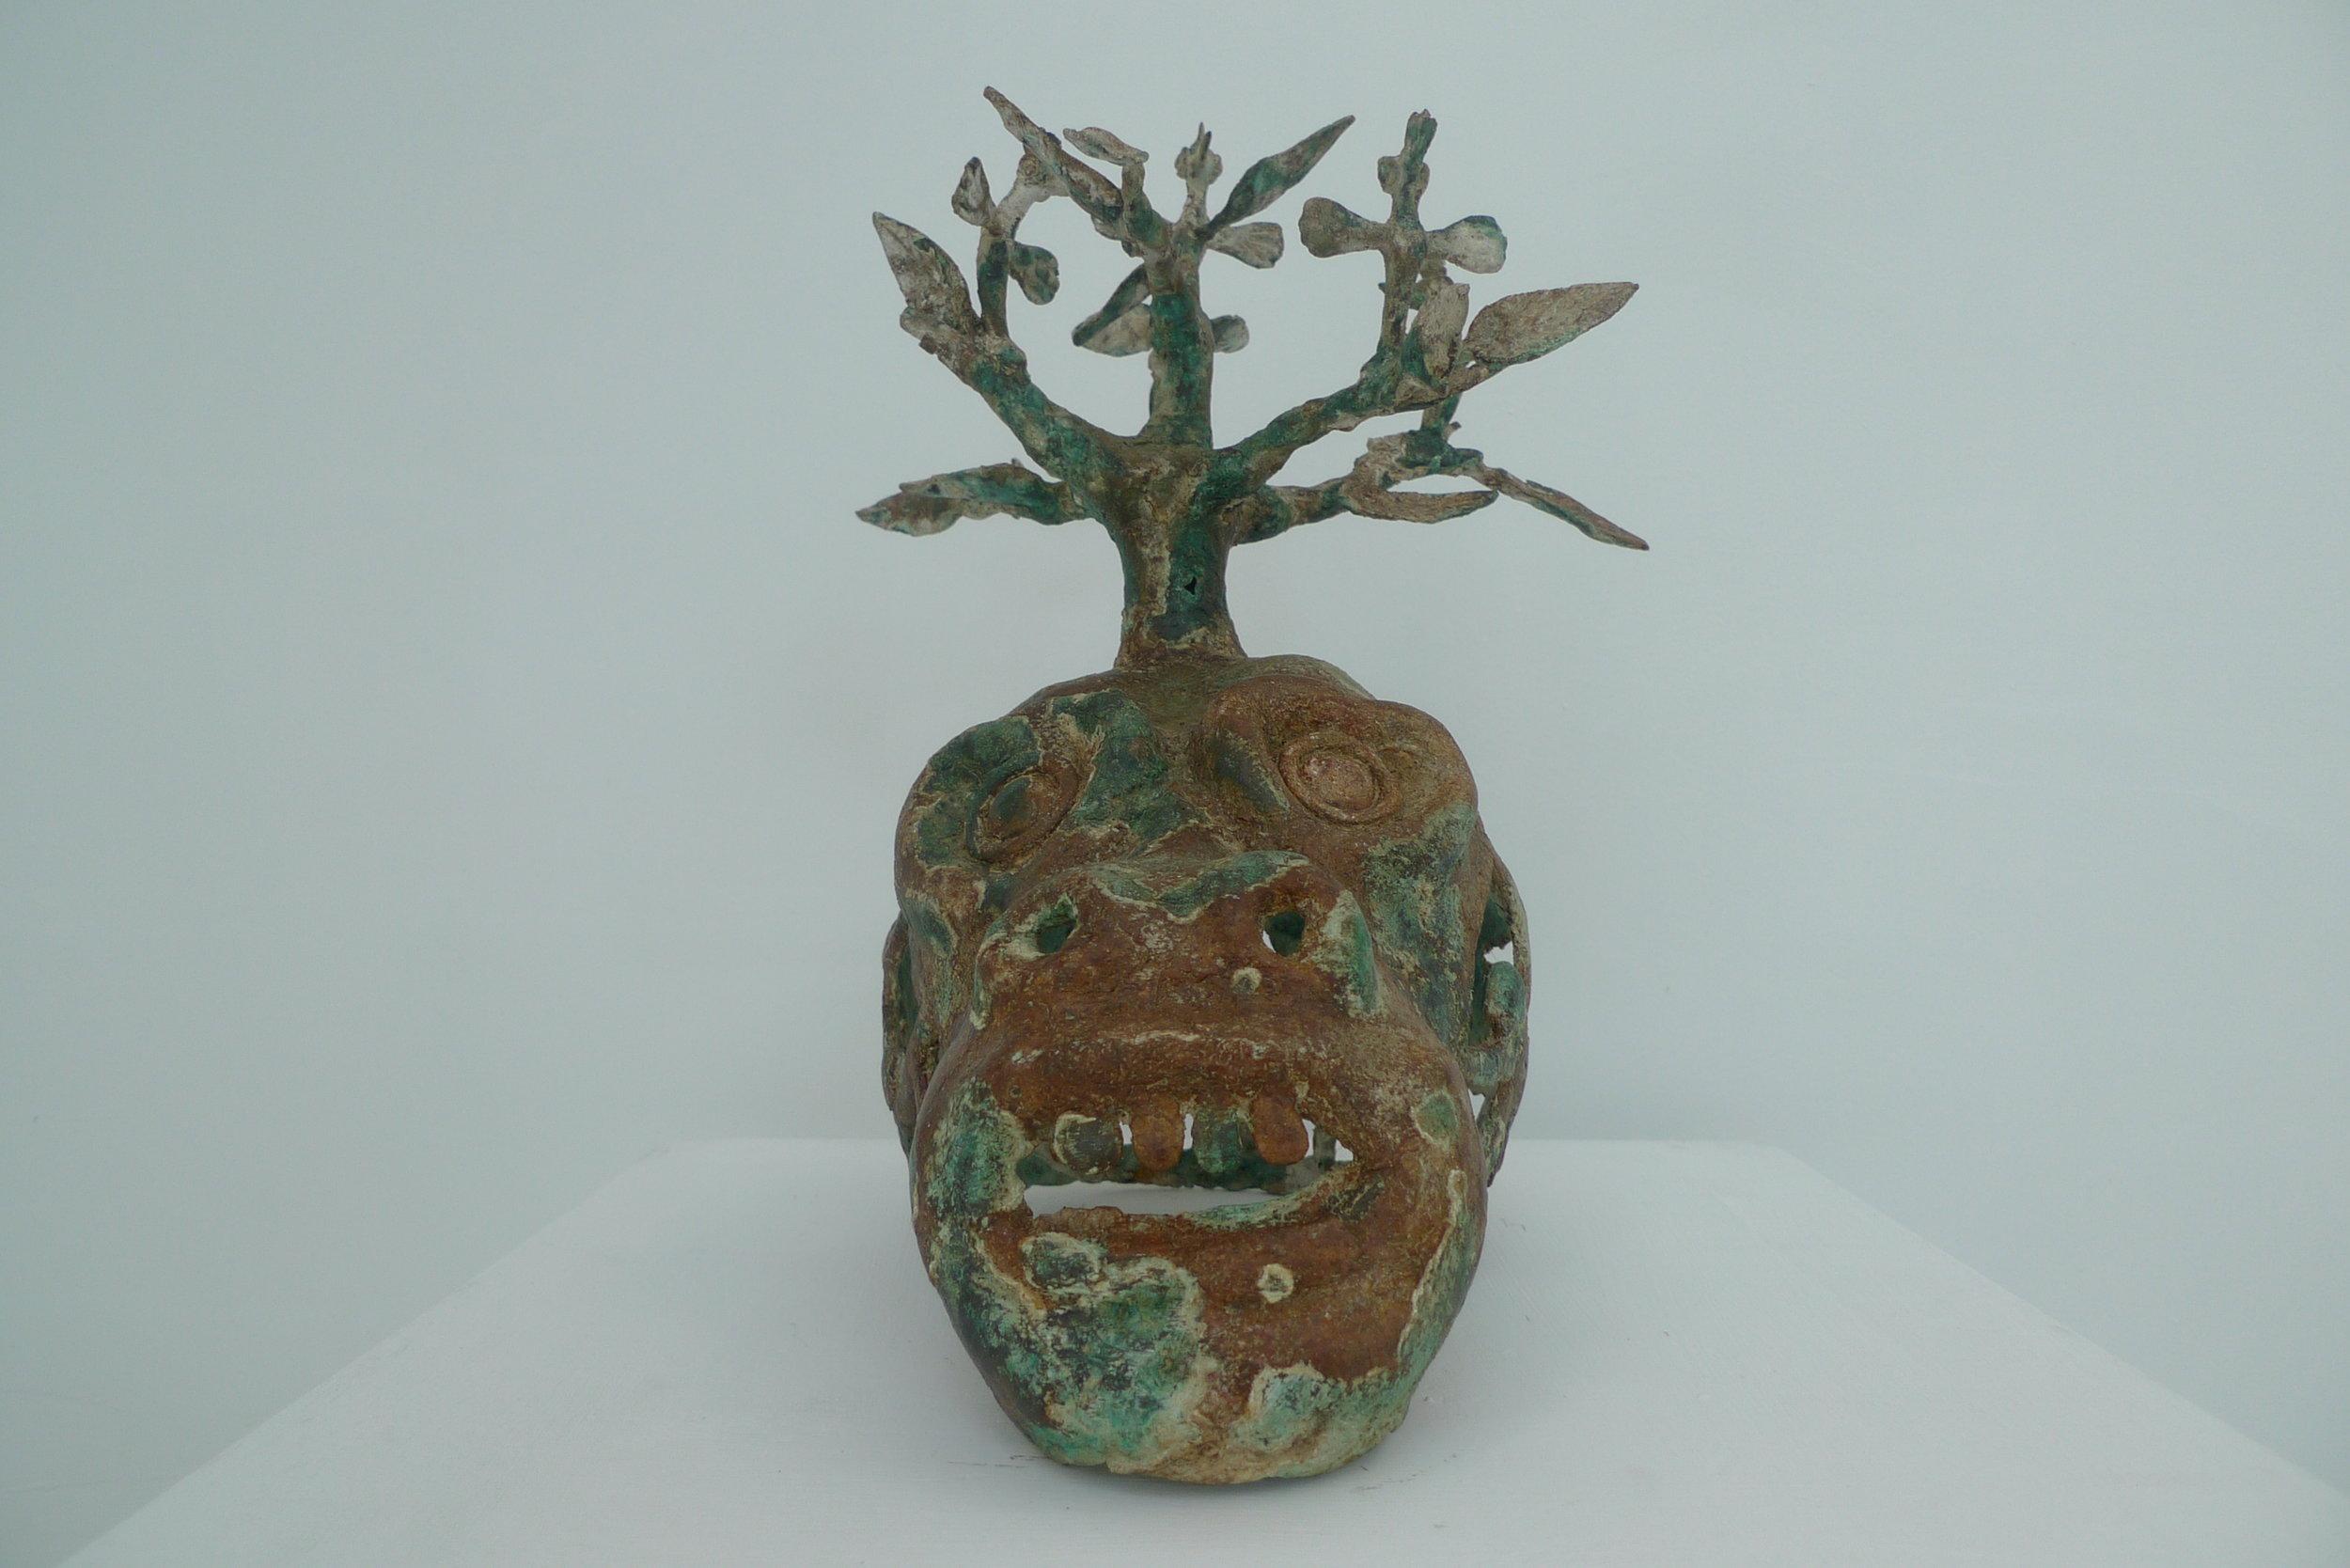 Histoire de têtes I, 30x40cm, Sculpture bronze, 2018